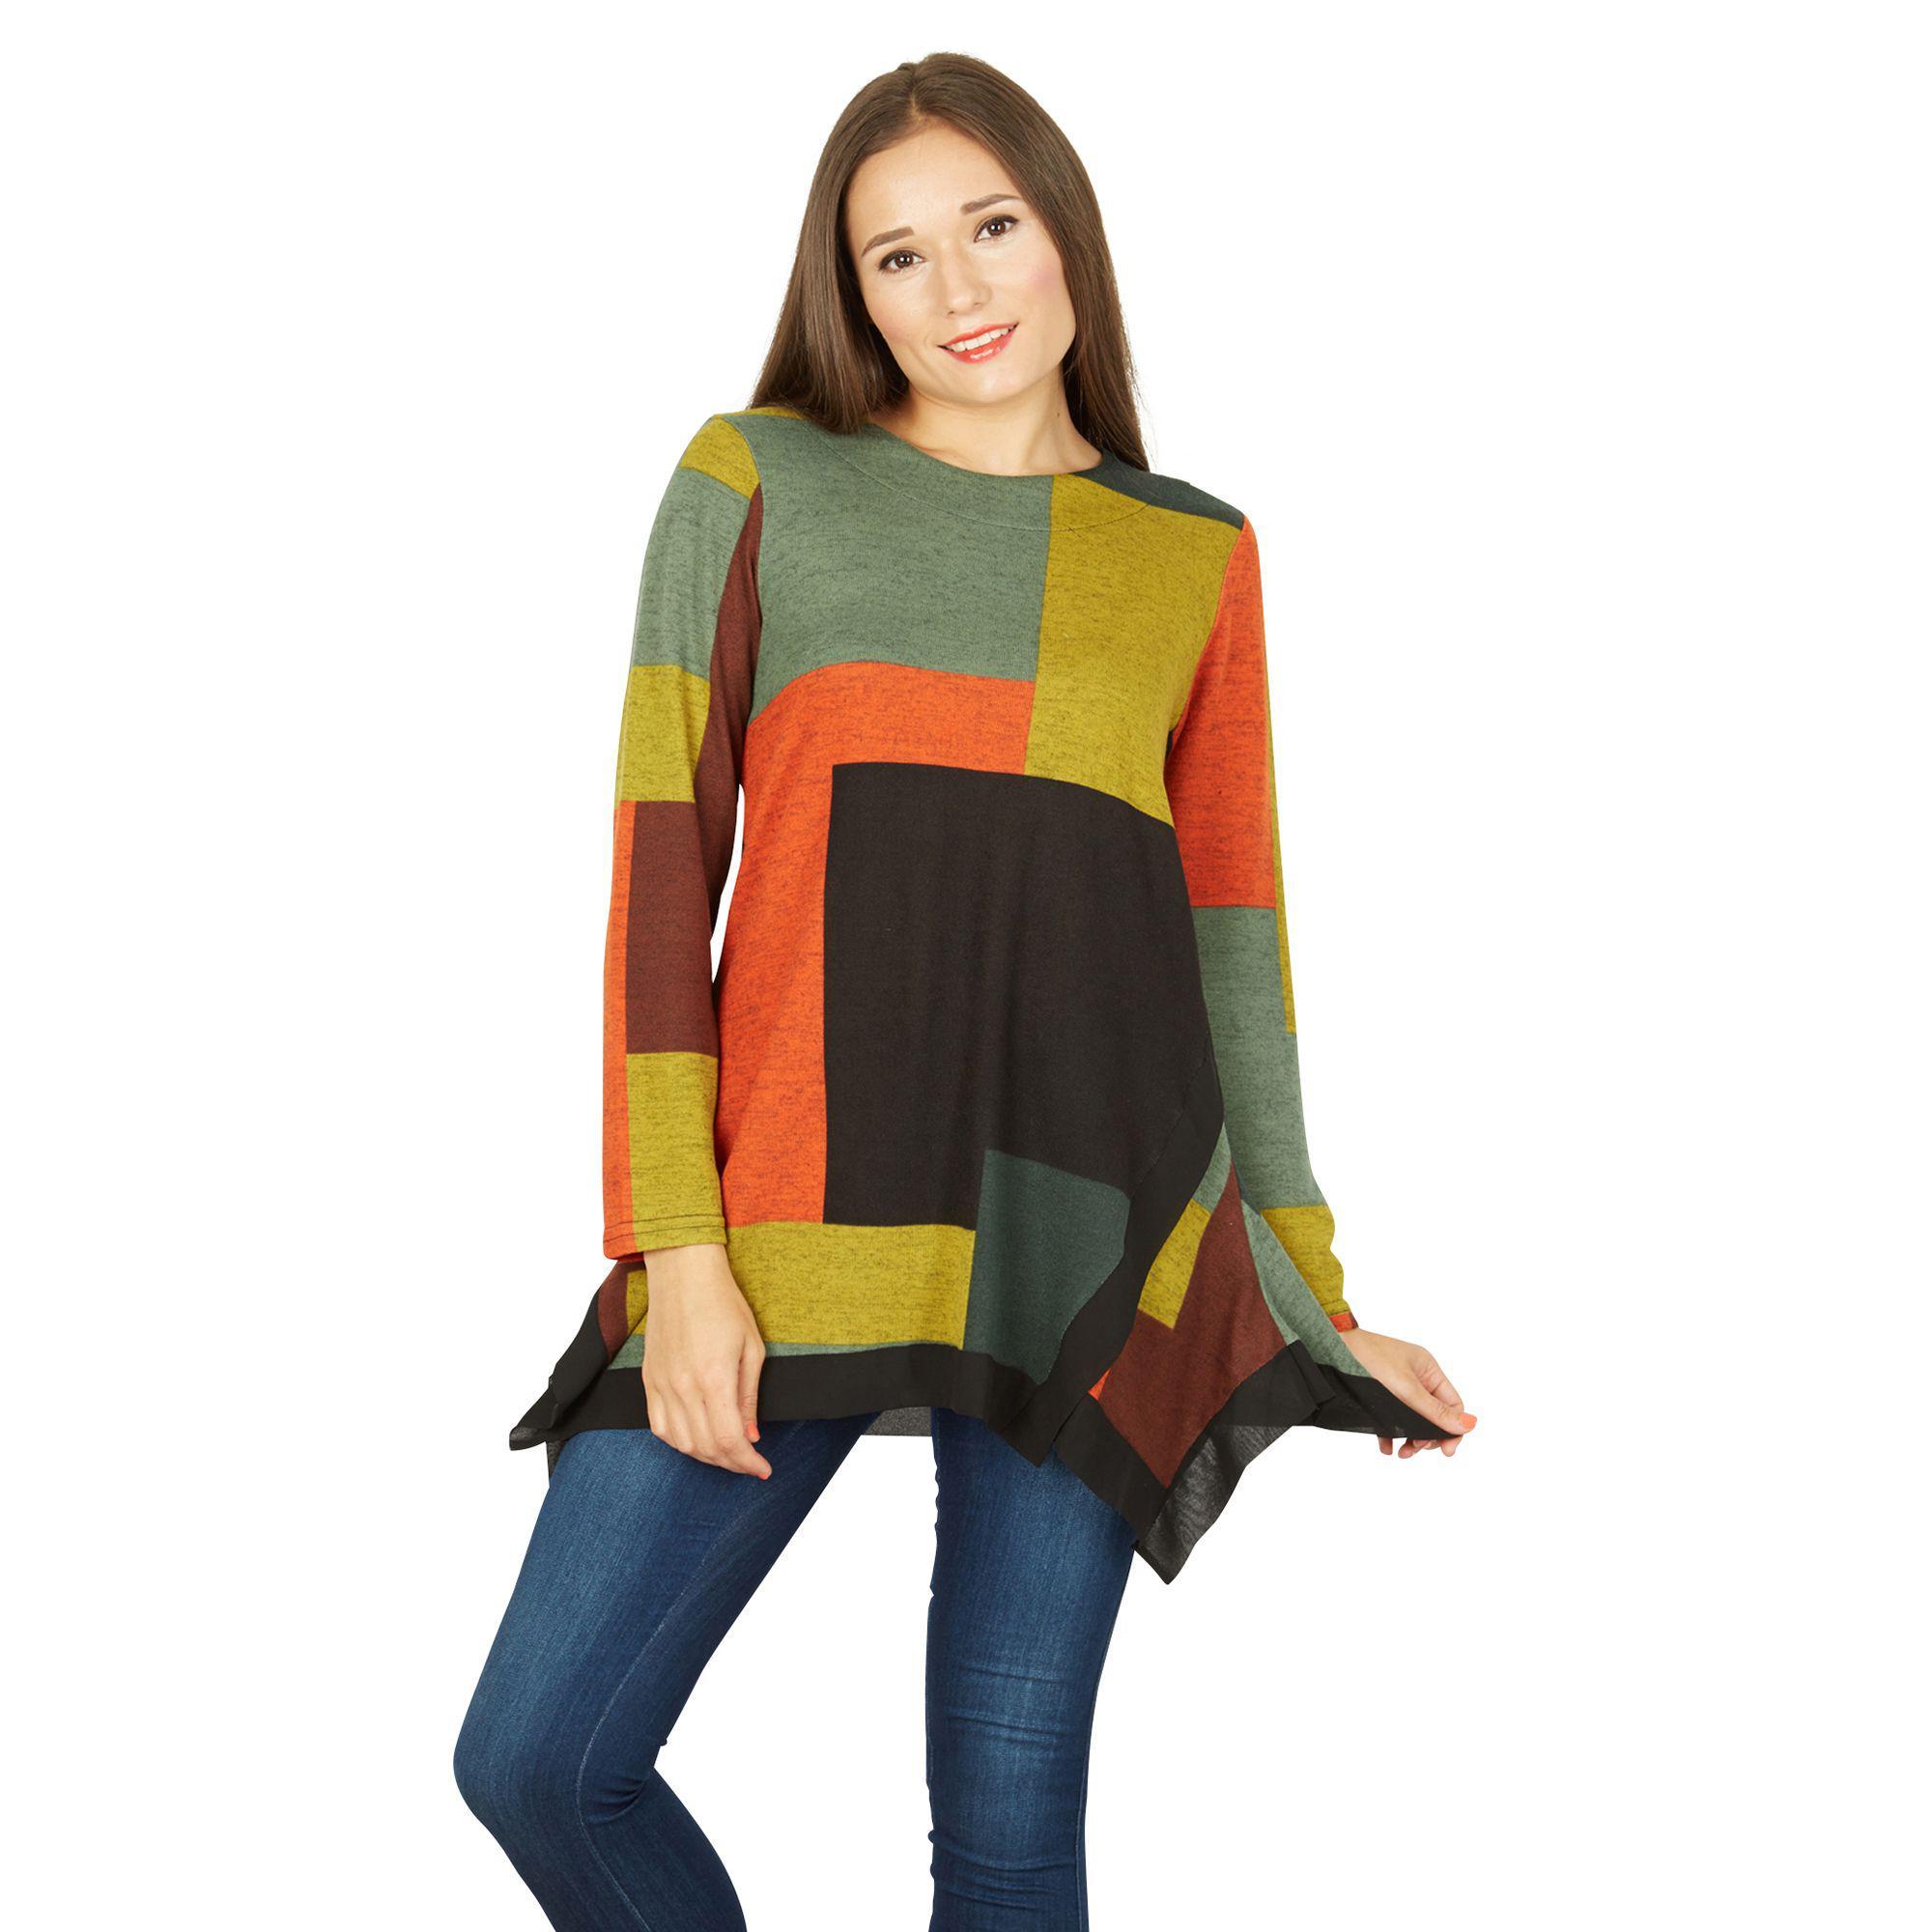 68dded350176 Tenki Multicoloured Full Sleeve Block Print Top - Lyst